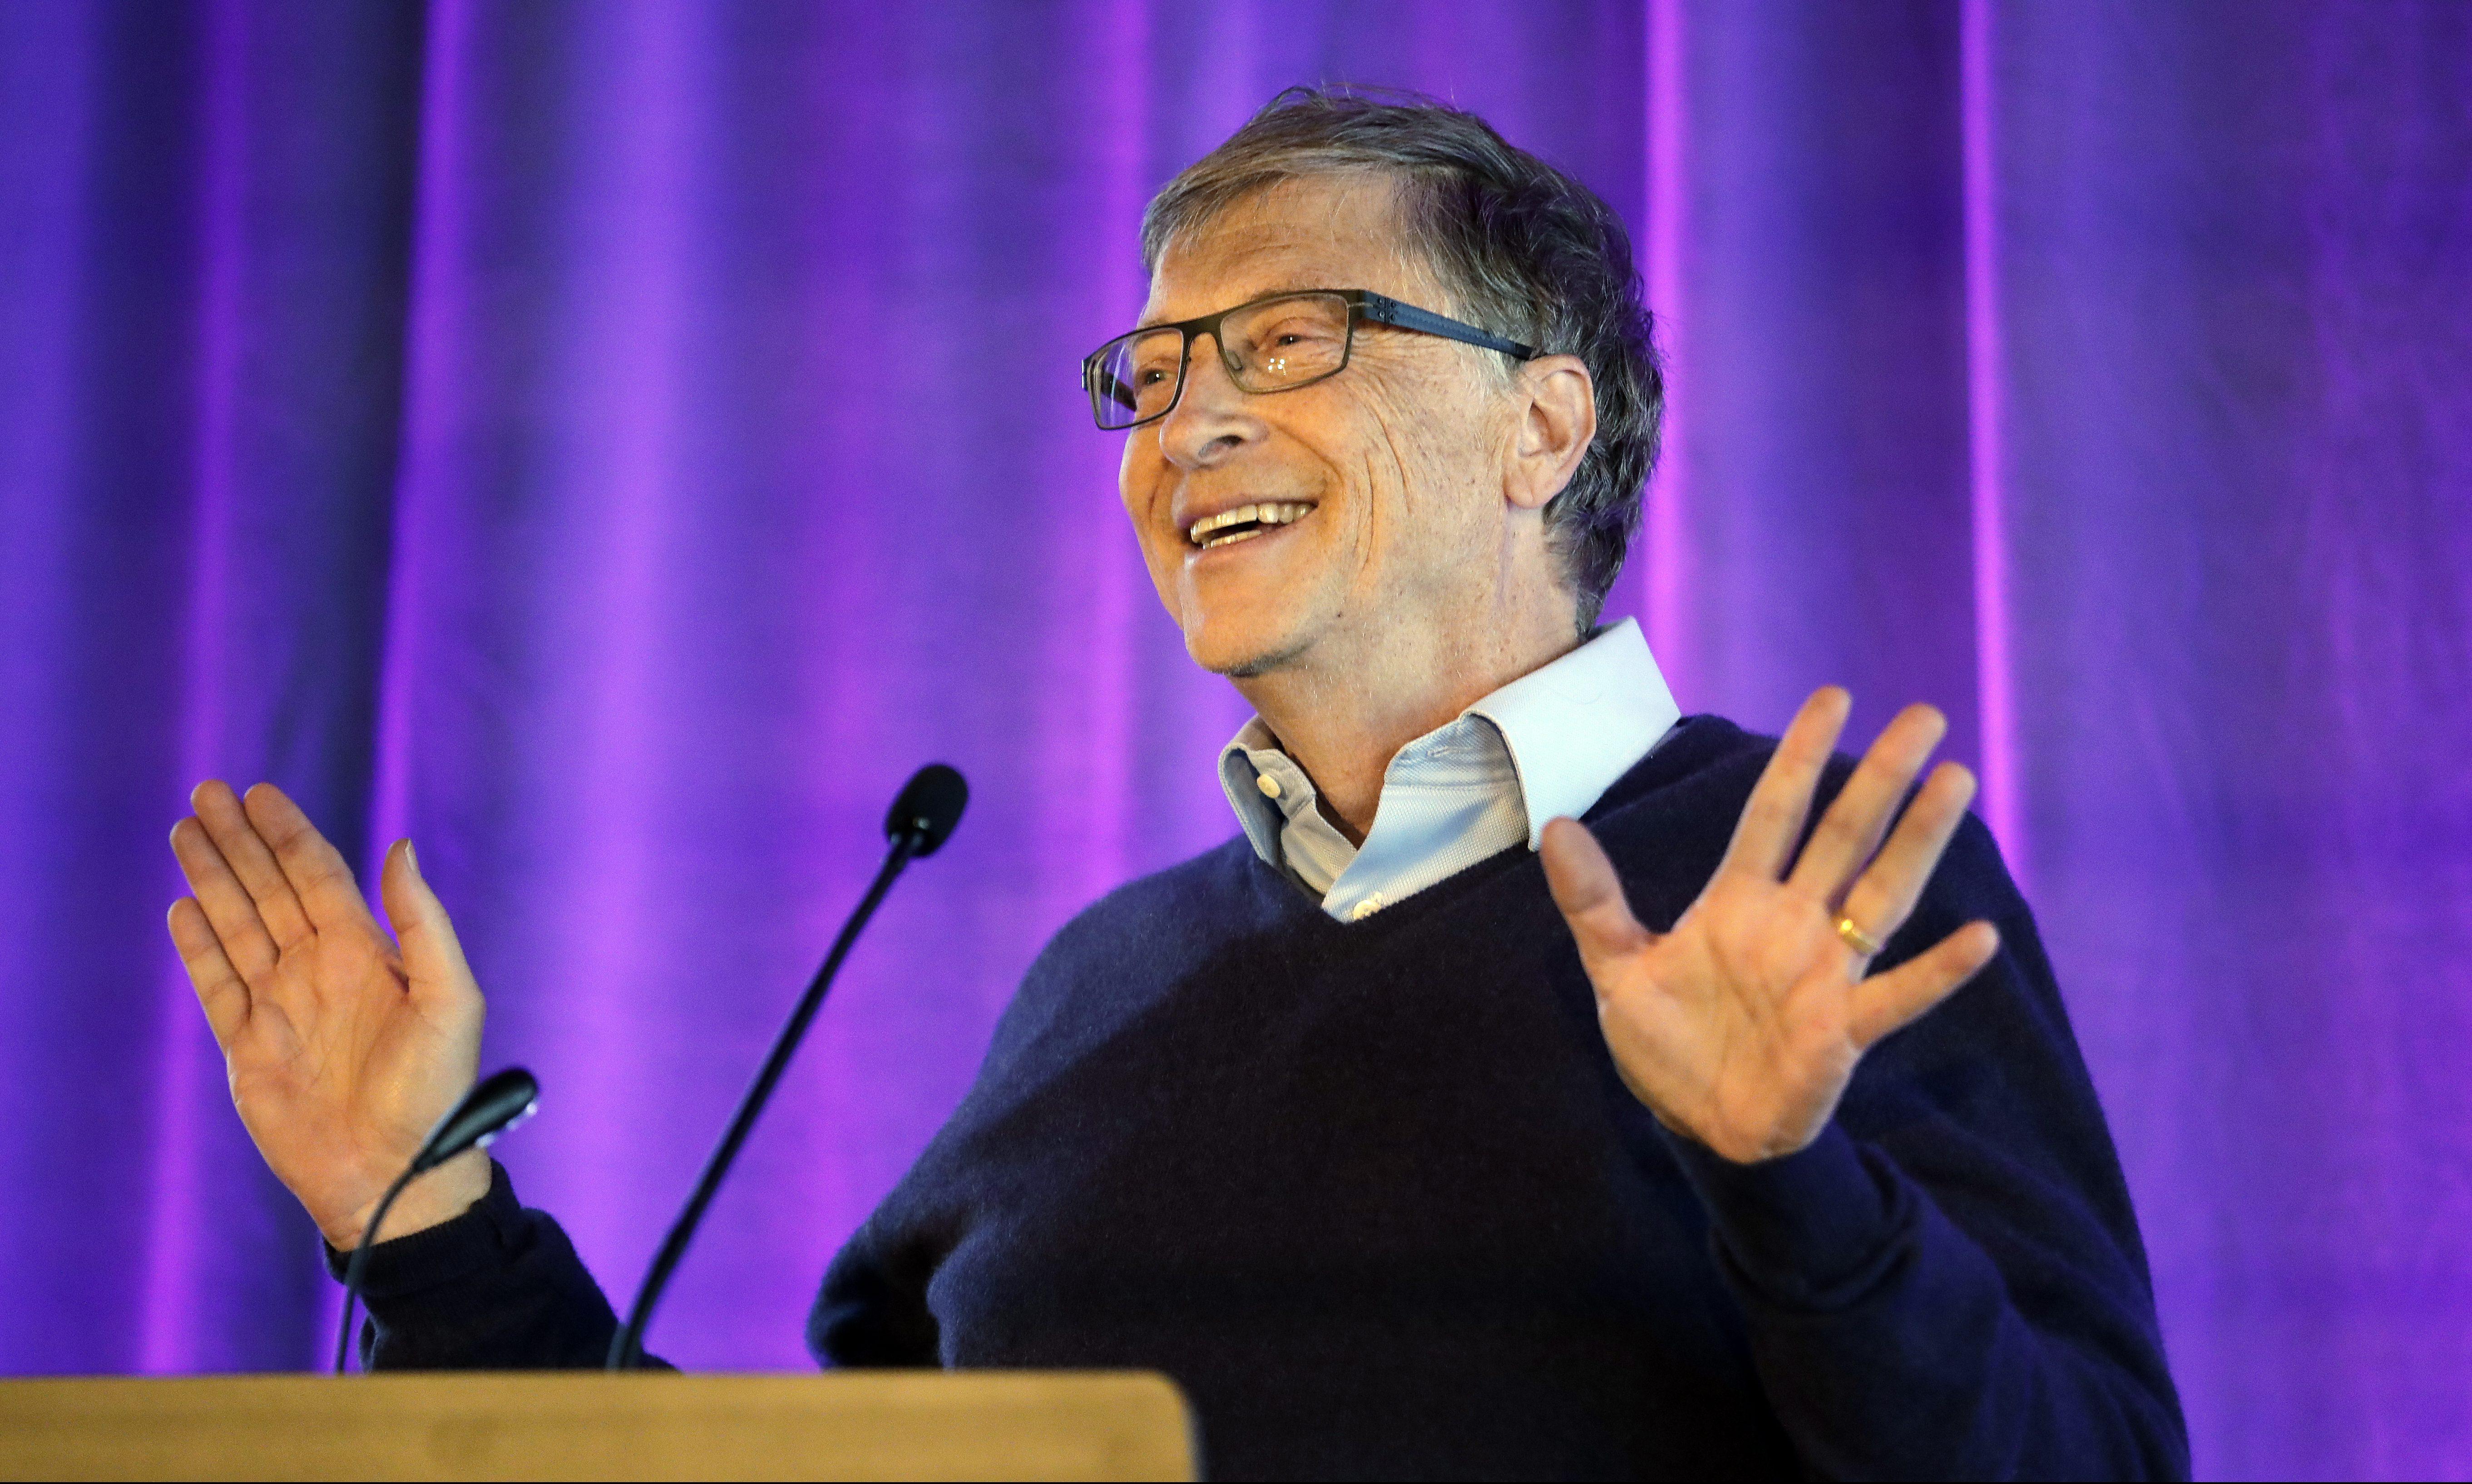 Microsoft co-founder Bill Gates speaks